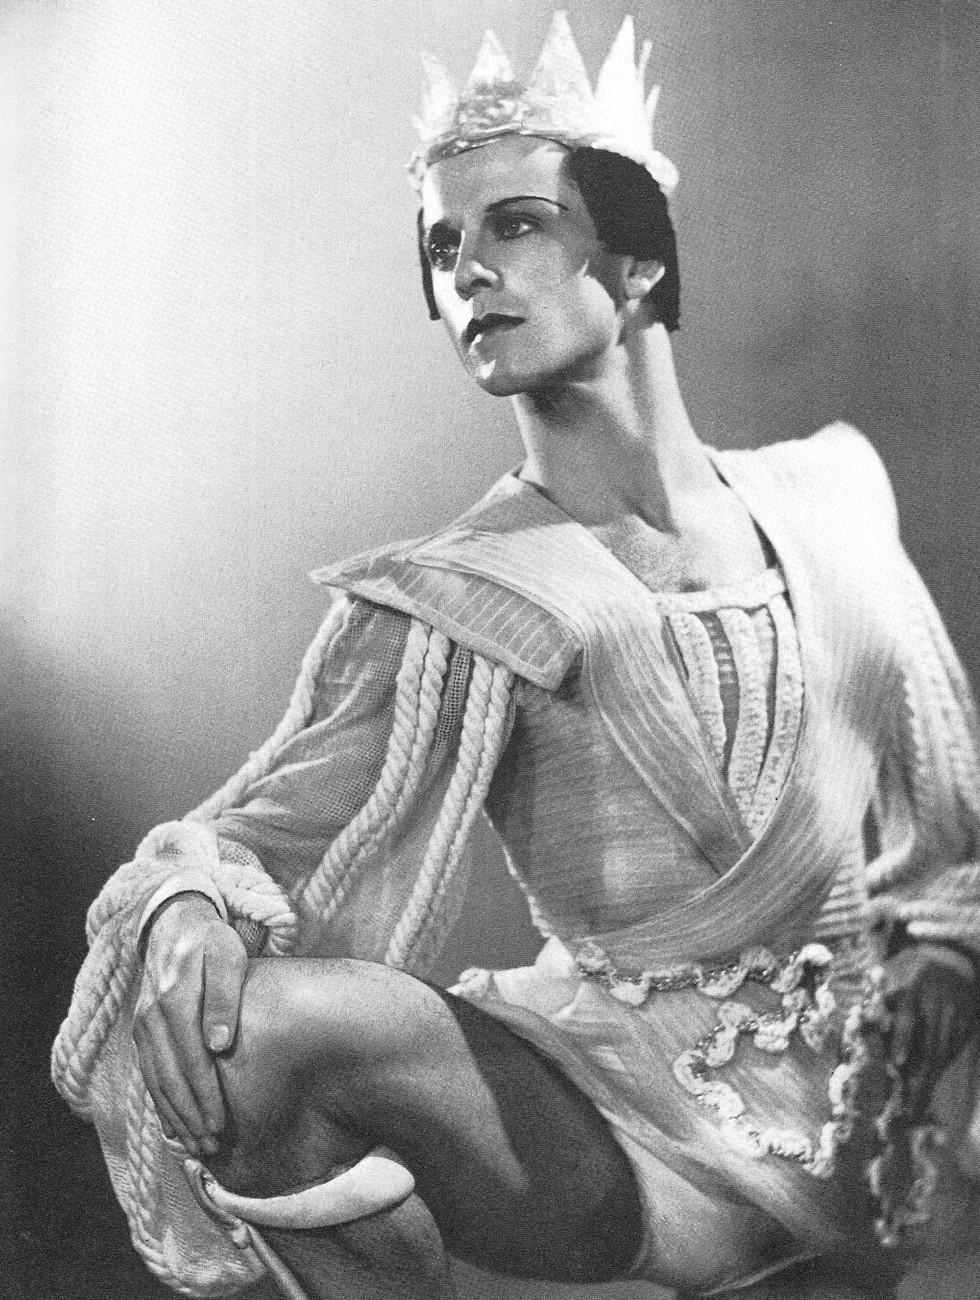 Recordando a Hans Zulling, el bailarín favorito de Kurt Joos